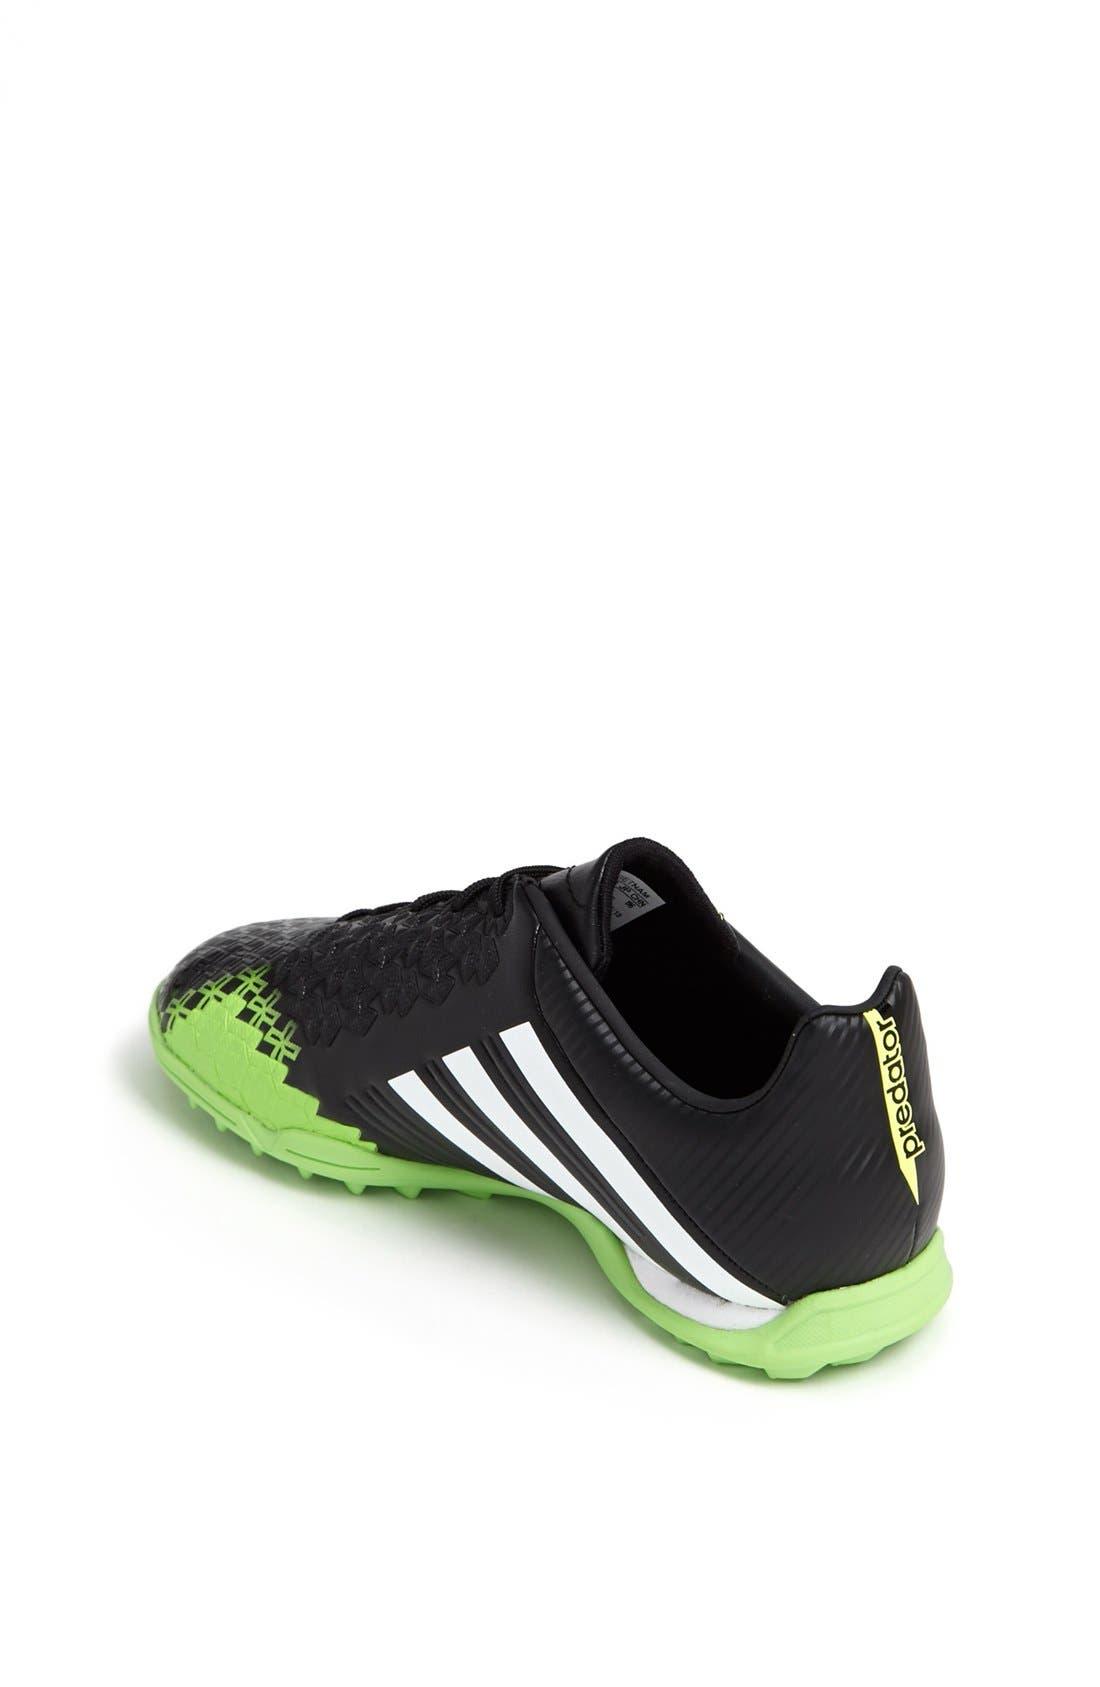 Alternate Image 2  - adidas 'Predator Absolado LZ TRX TF' Soccer Shoe (Toddler, Little Kid & Big Kid)